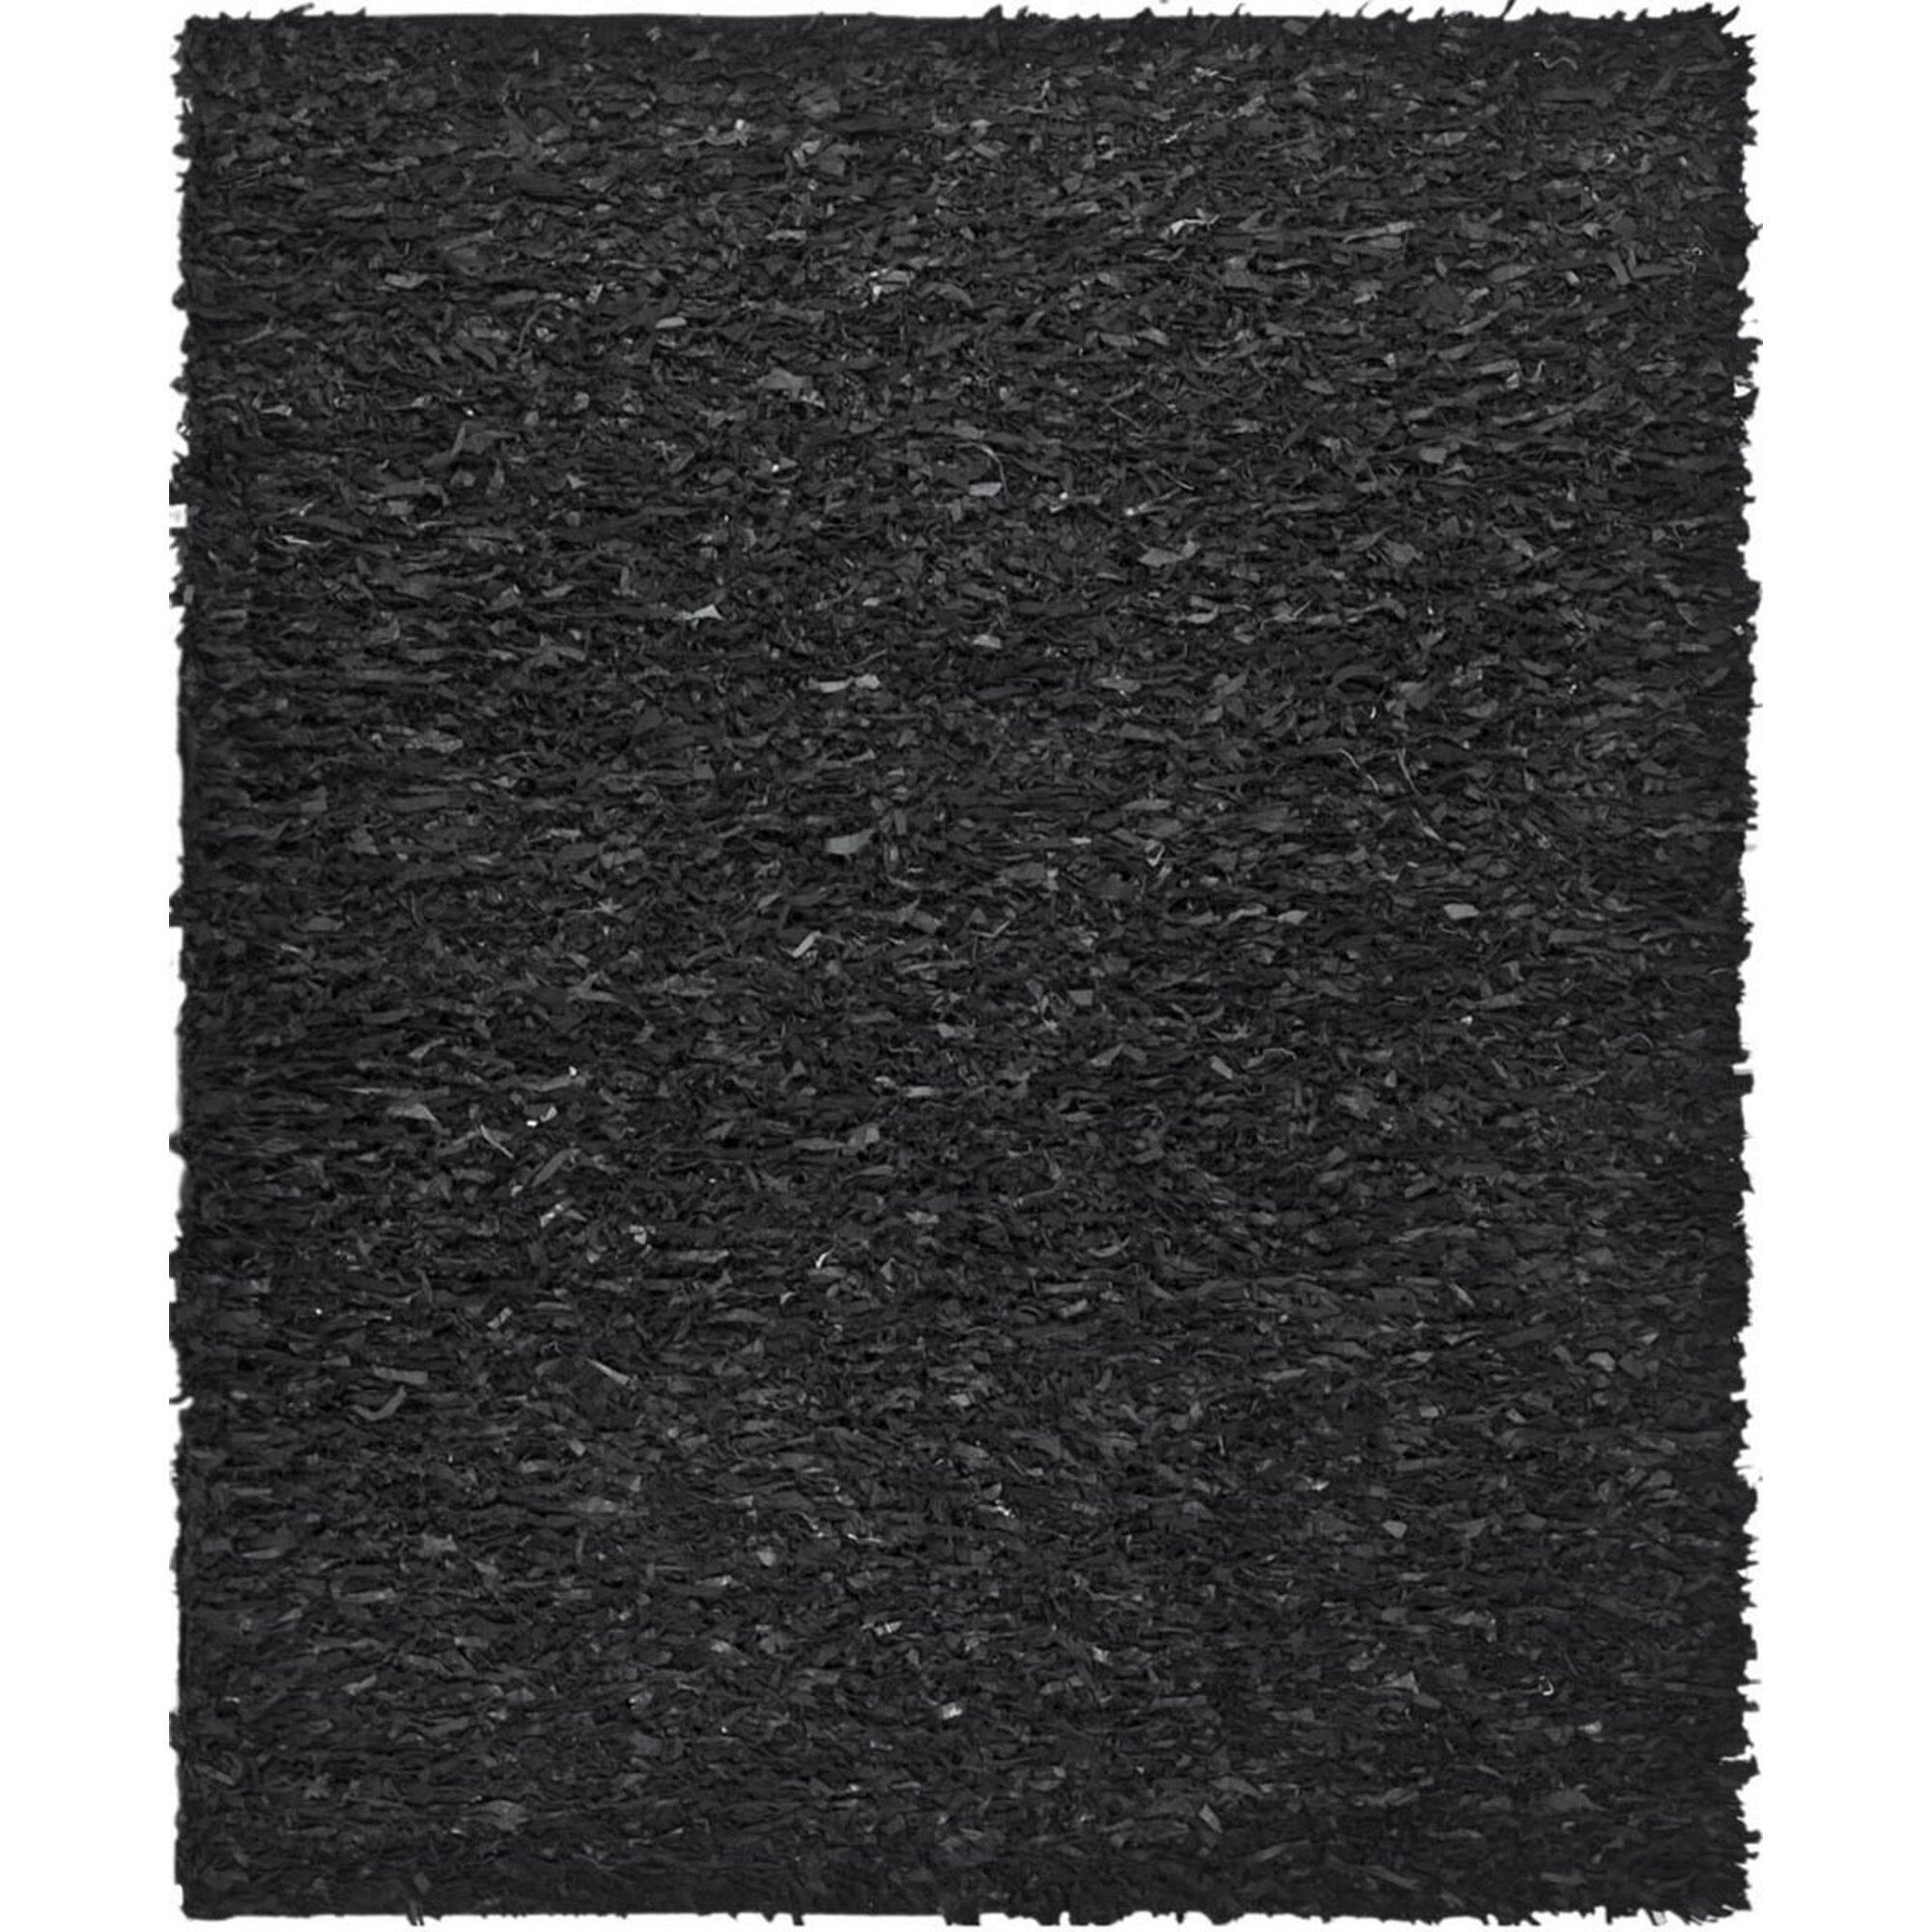 Safavieh Leather Shag Black Area Rug I Reviews Wayfair